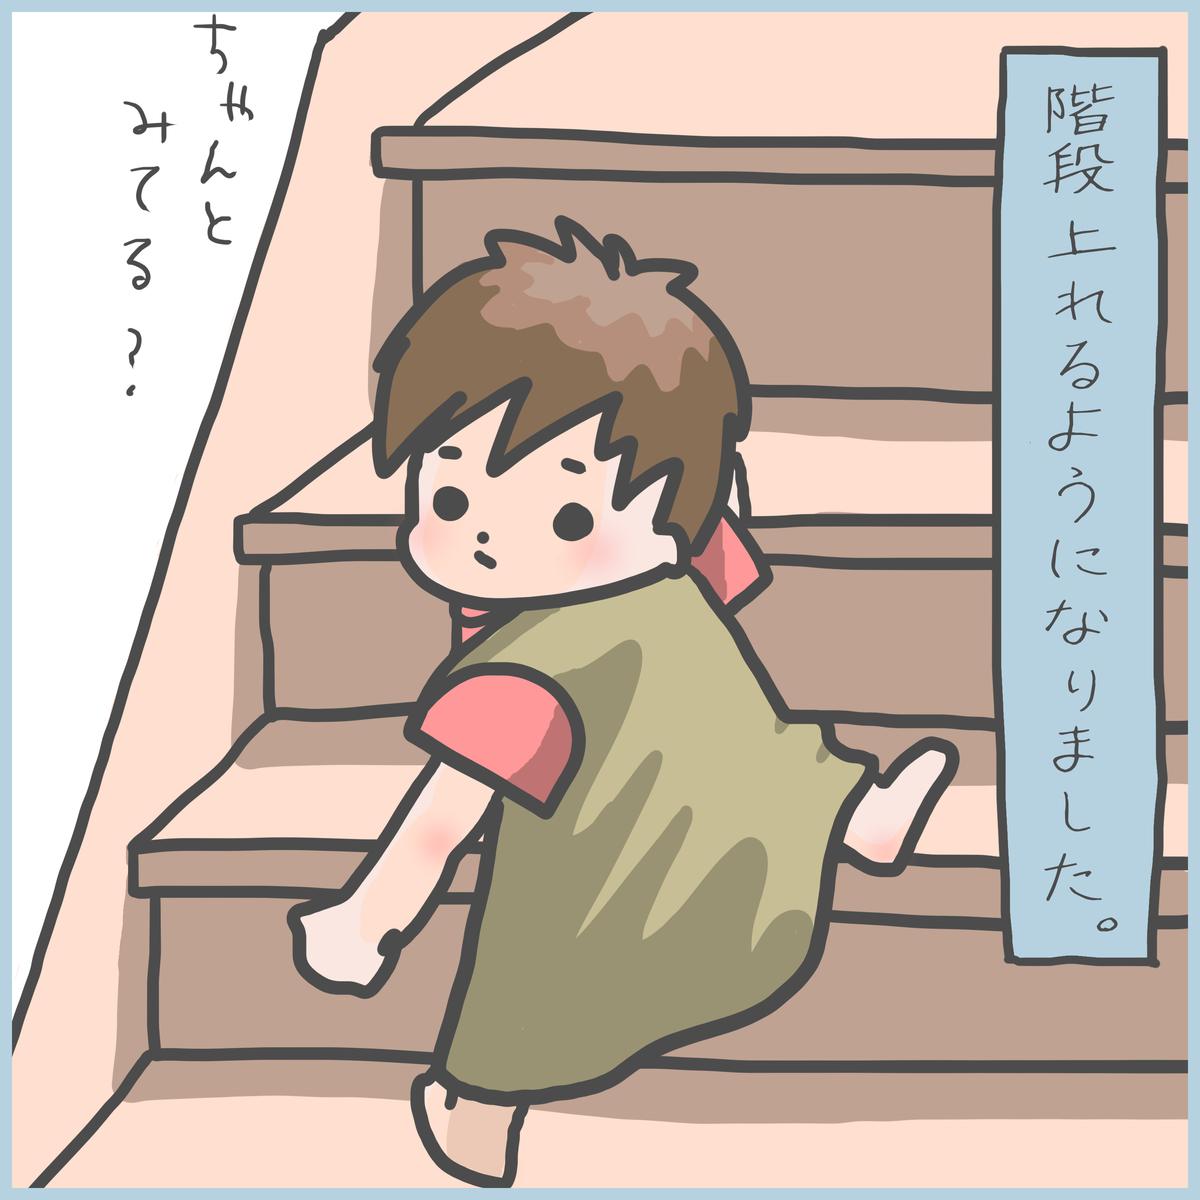 f:id:ika_yoshi:20201206005129j:plain